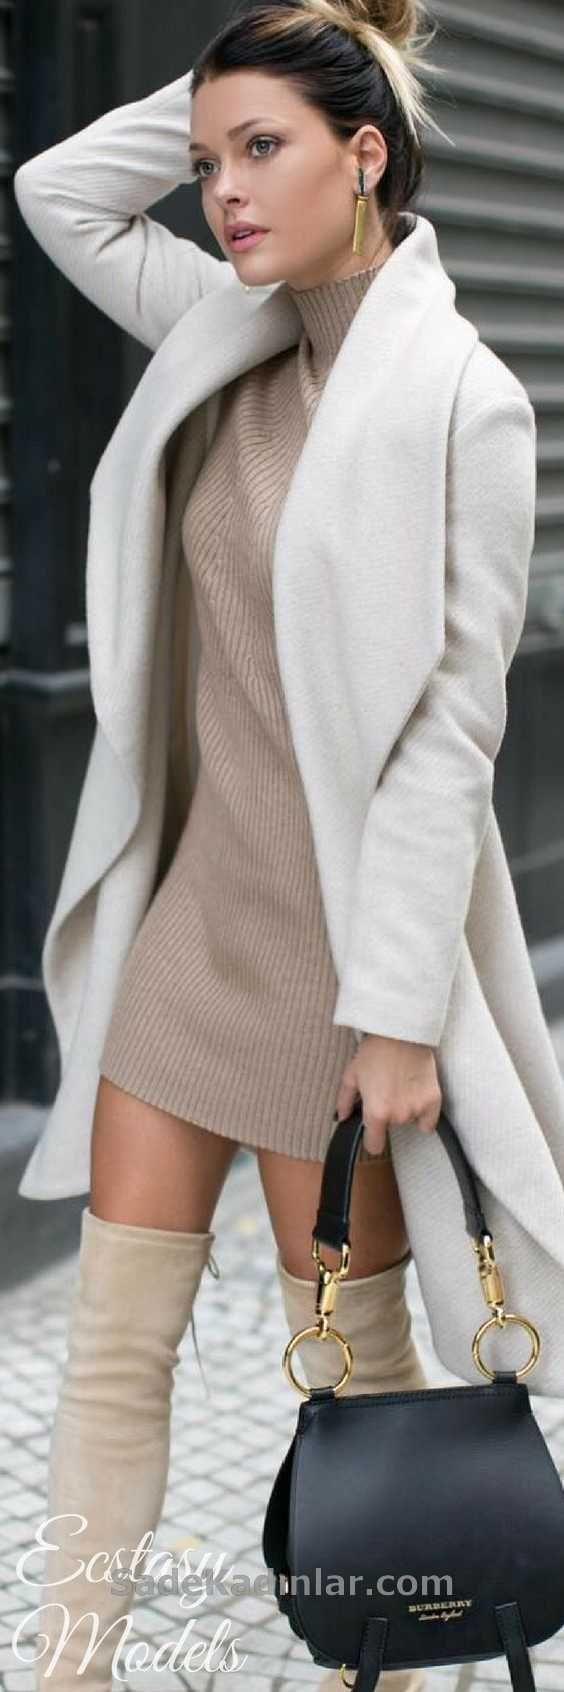 #beige #Coat #Kleid #Modelle #Nerz #Pullover